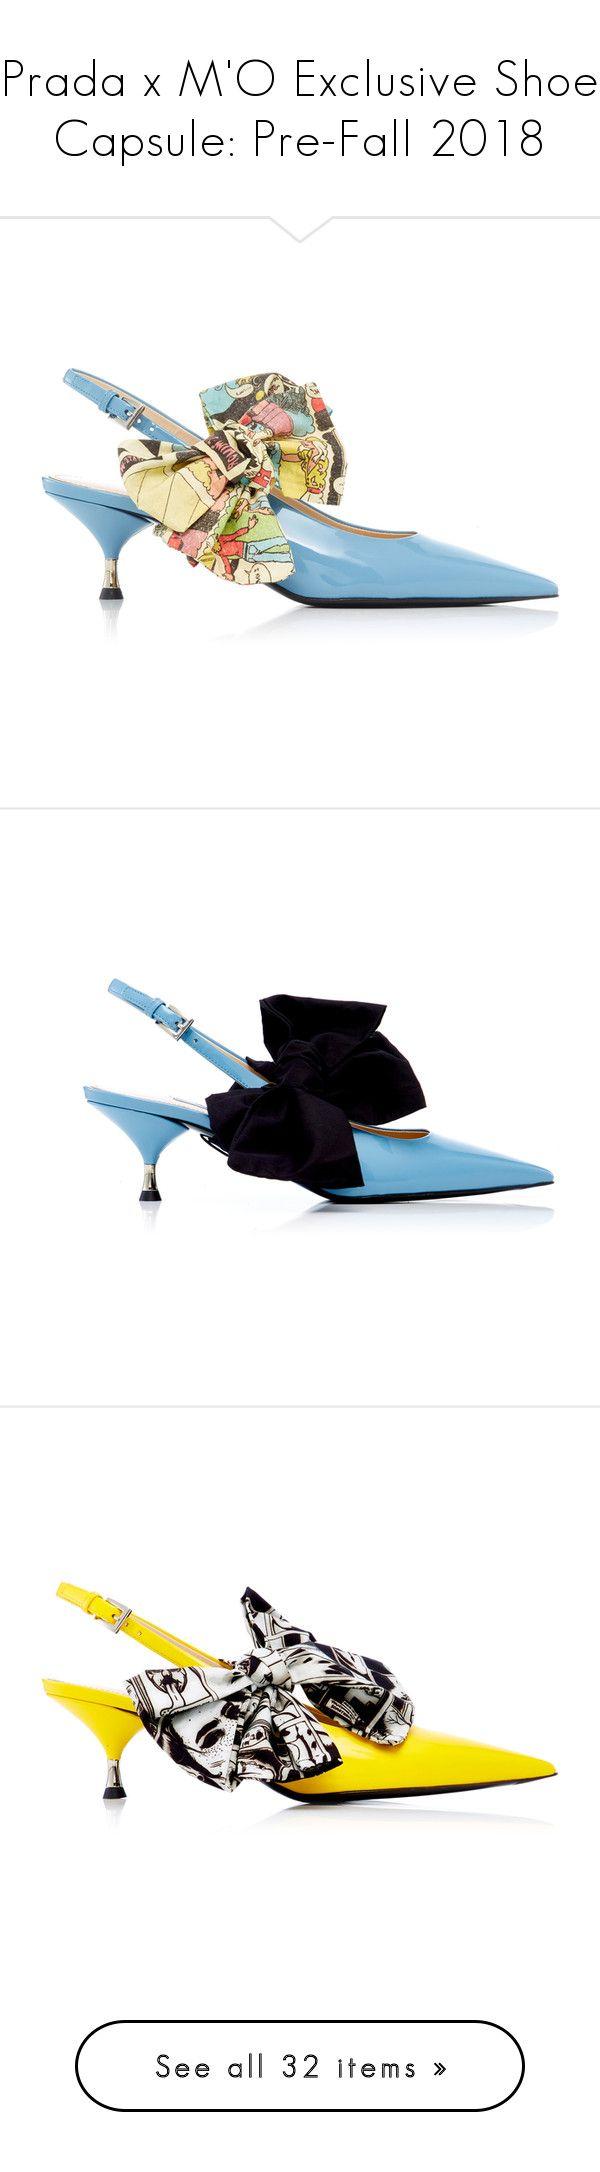 """Prada x M'O Exclusive Shoe Capsule: Pre-Fall 2018"" by livnd ❤ liked on Polyvore featuring shoes, Prada, livndshoes, livndprada, prefall2018, black kitten heel shoes, black shoes, black patent shoes, patent shoes and kitten heel slingback shoes"